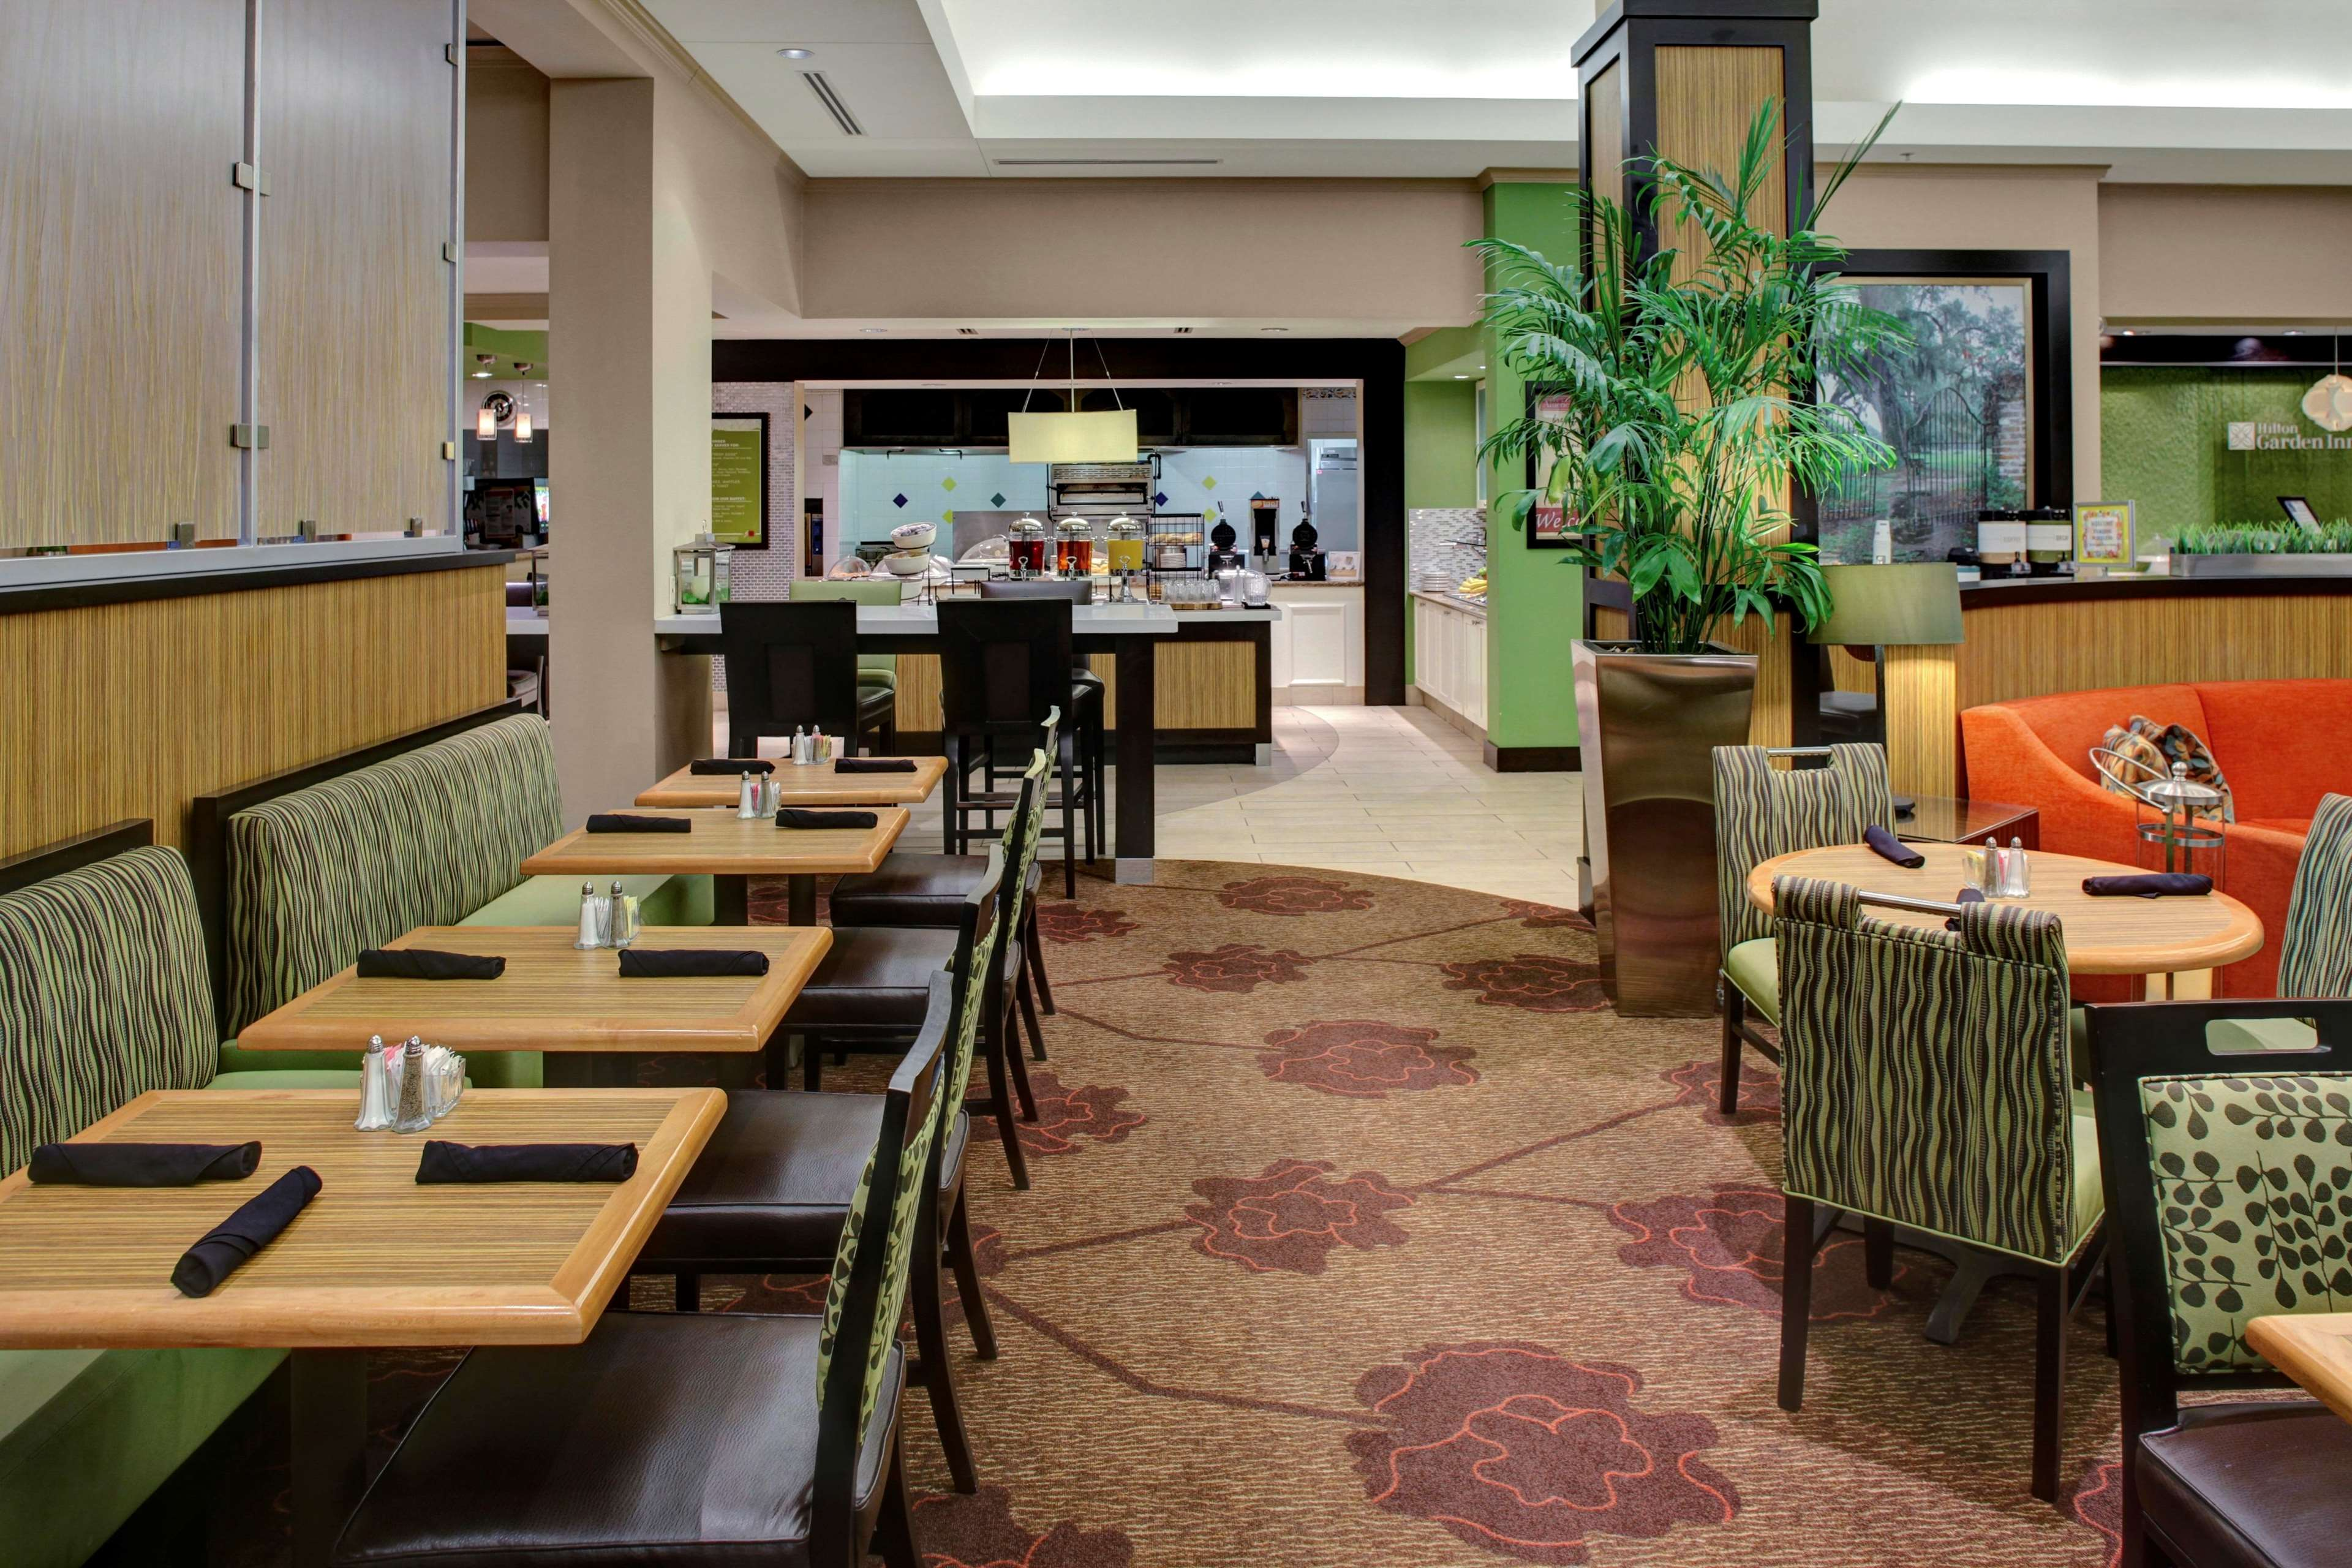 Hilton Garden Inn Atlanta North/Alpharetta 4025 Windward Plaza ...